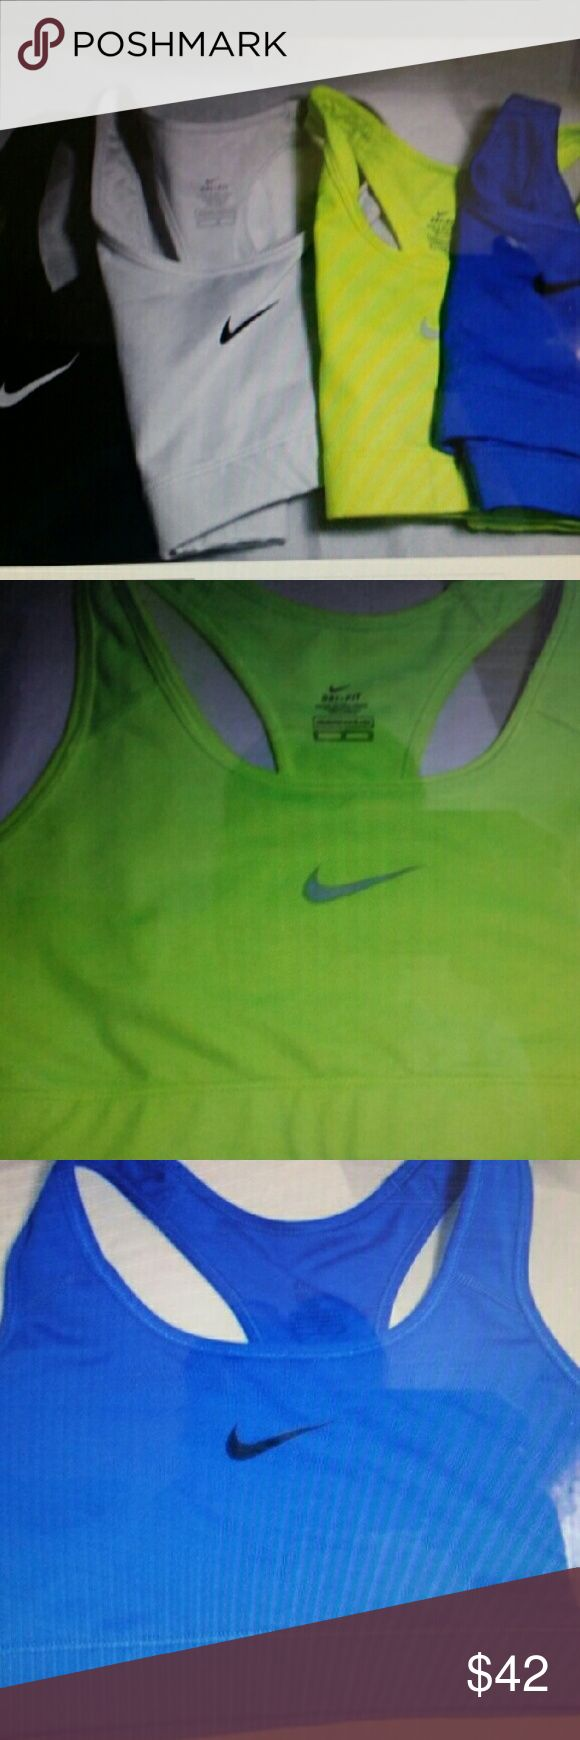 4 Nike dri fit sports bras Medium All 4 same size and style of Nike dri fit sports bras Size medium Gently worn excellent condition Blue, lime, black, white Nike Intimates & Sleepwear Bras